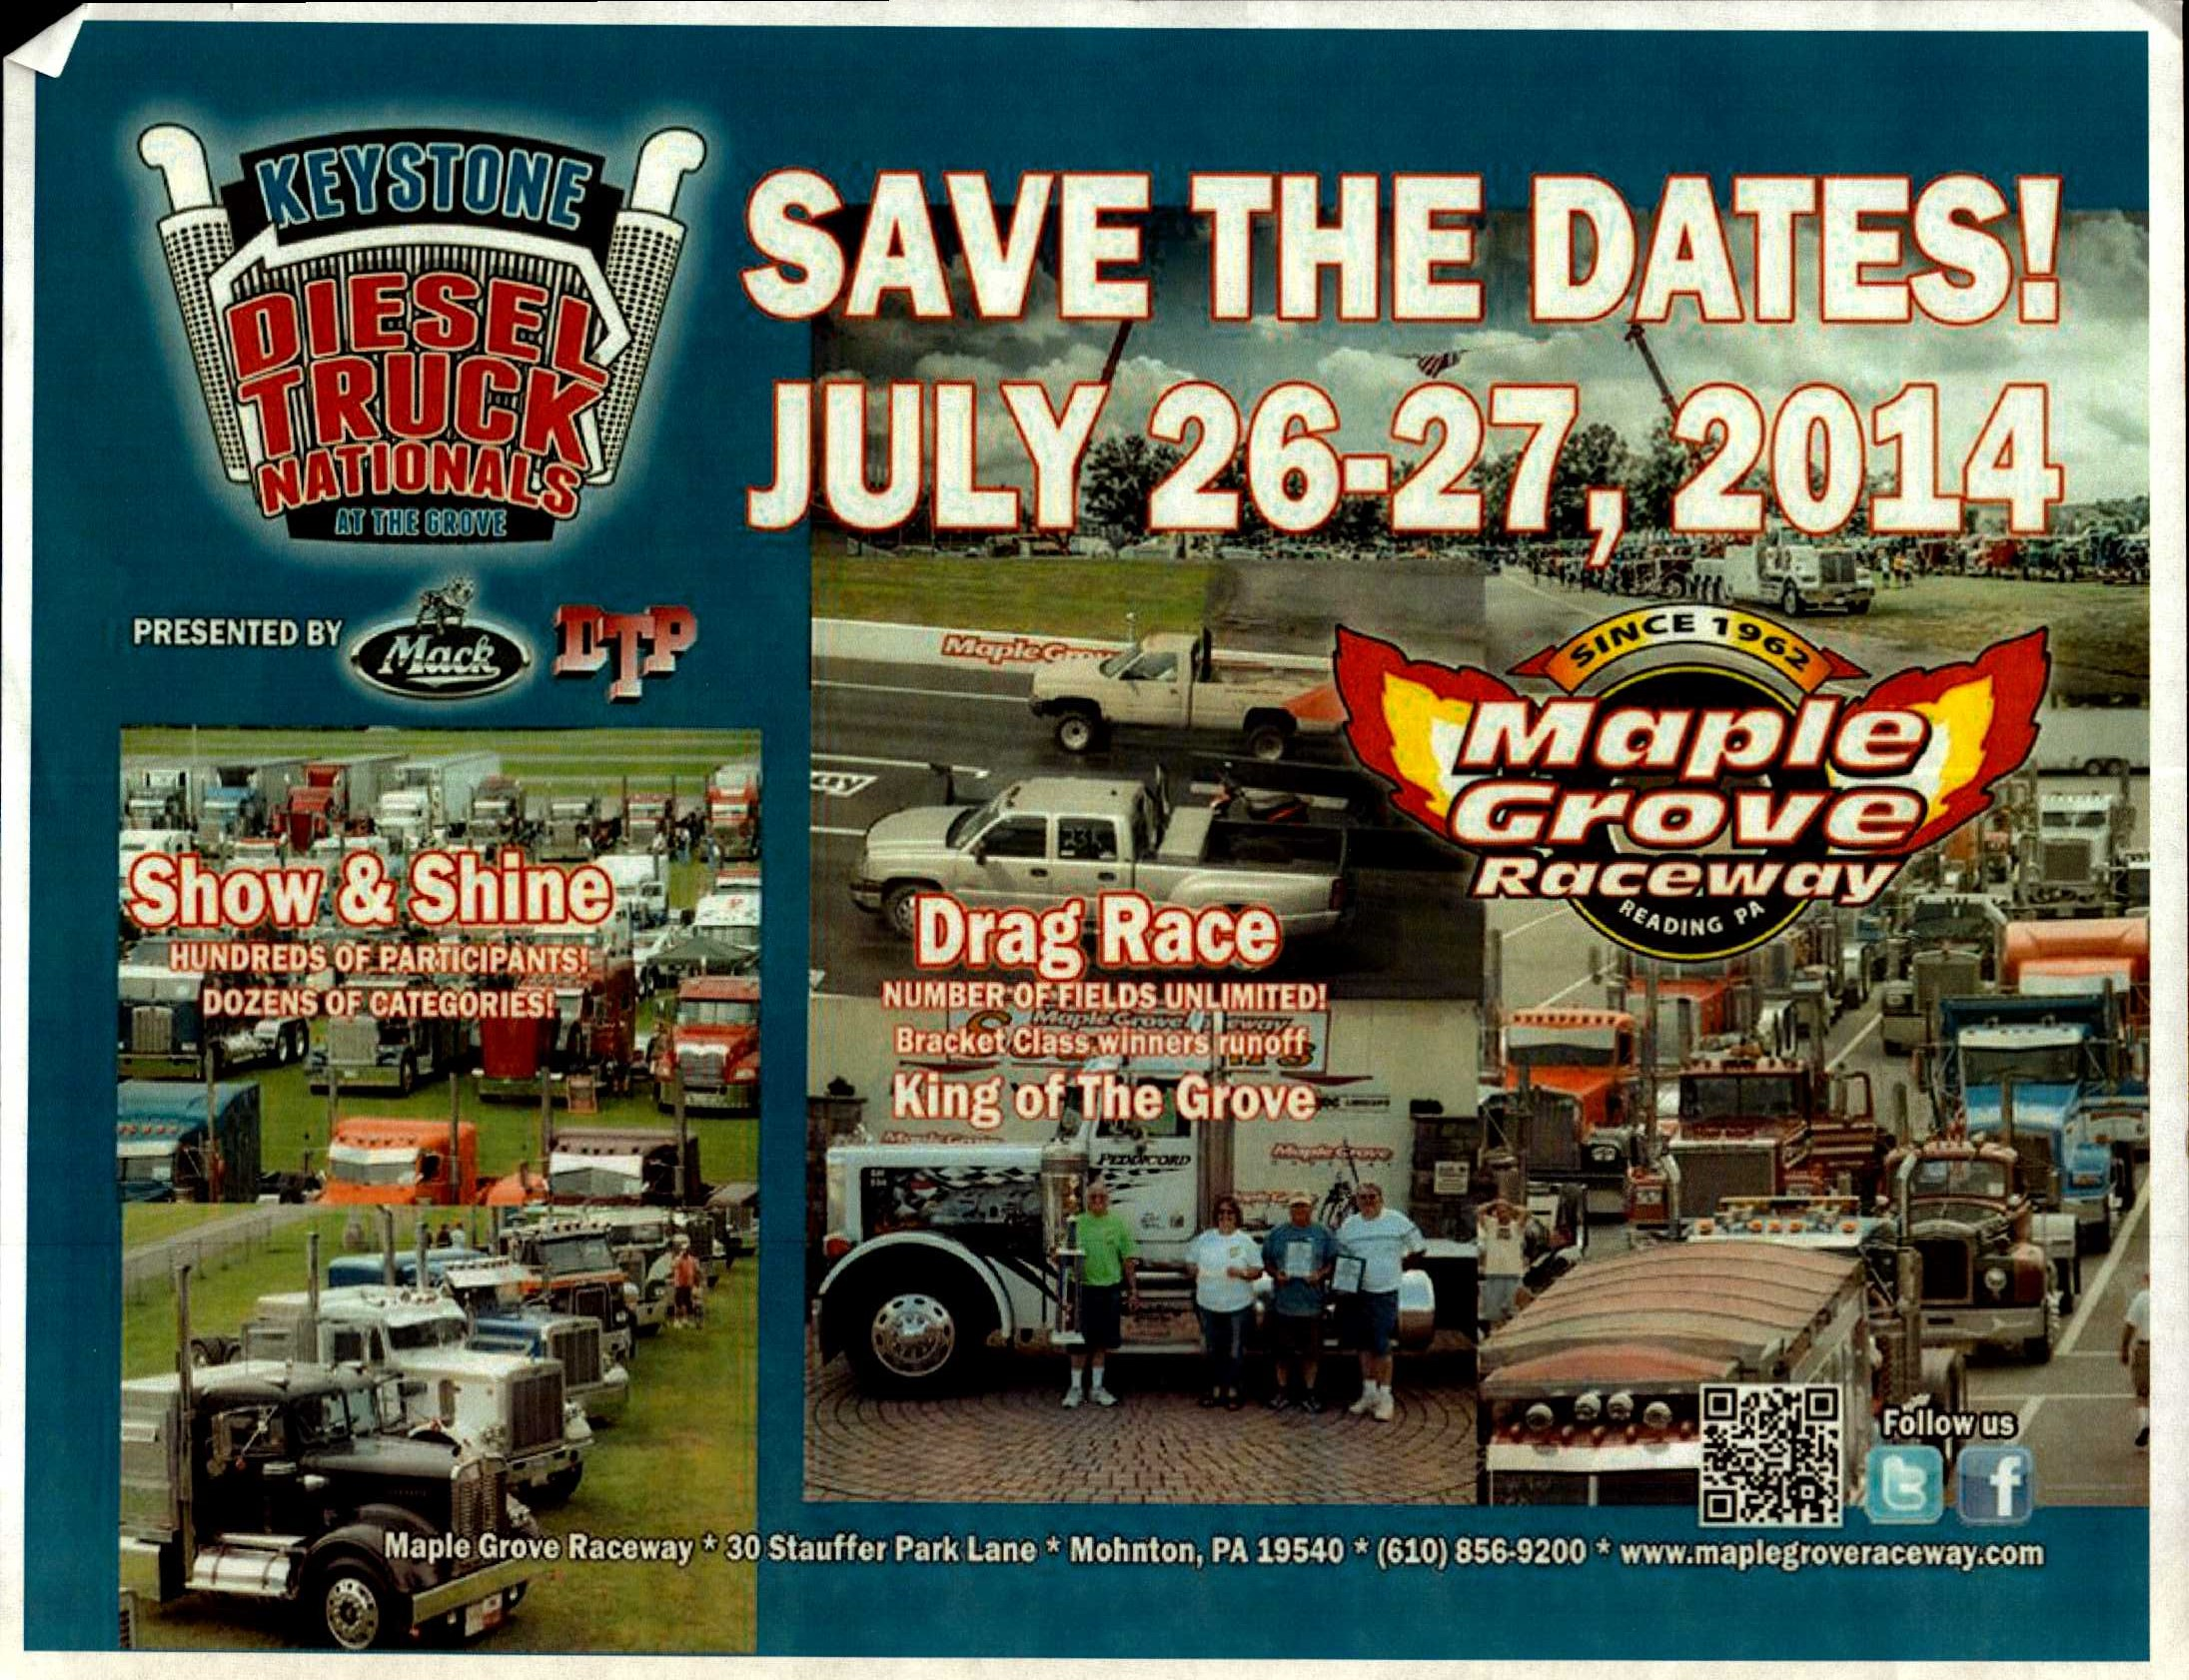 Jul 23 keystone diesel truck nationals reading pa